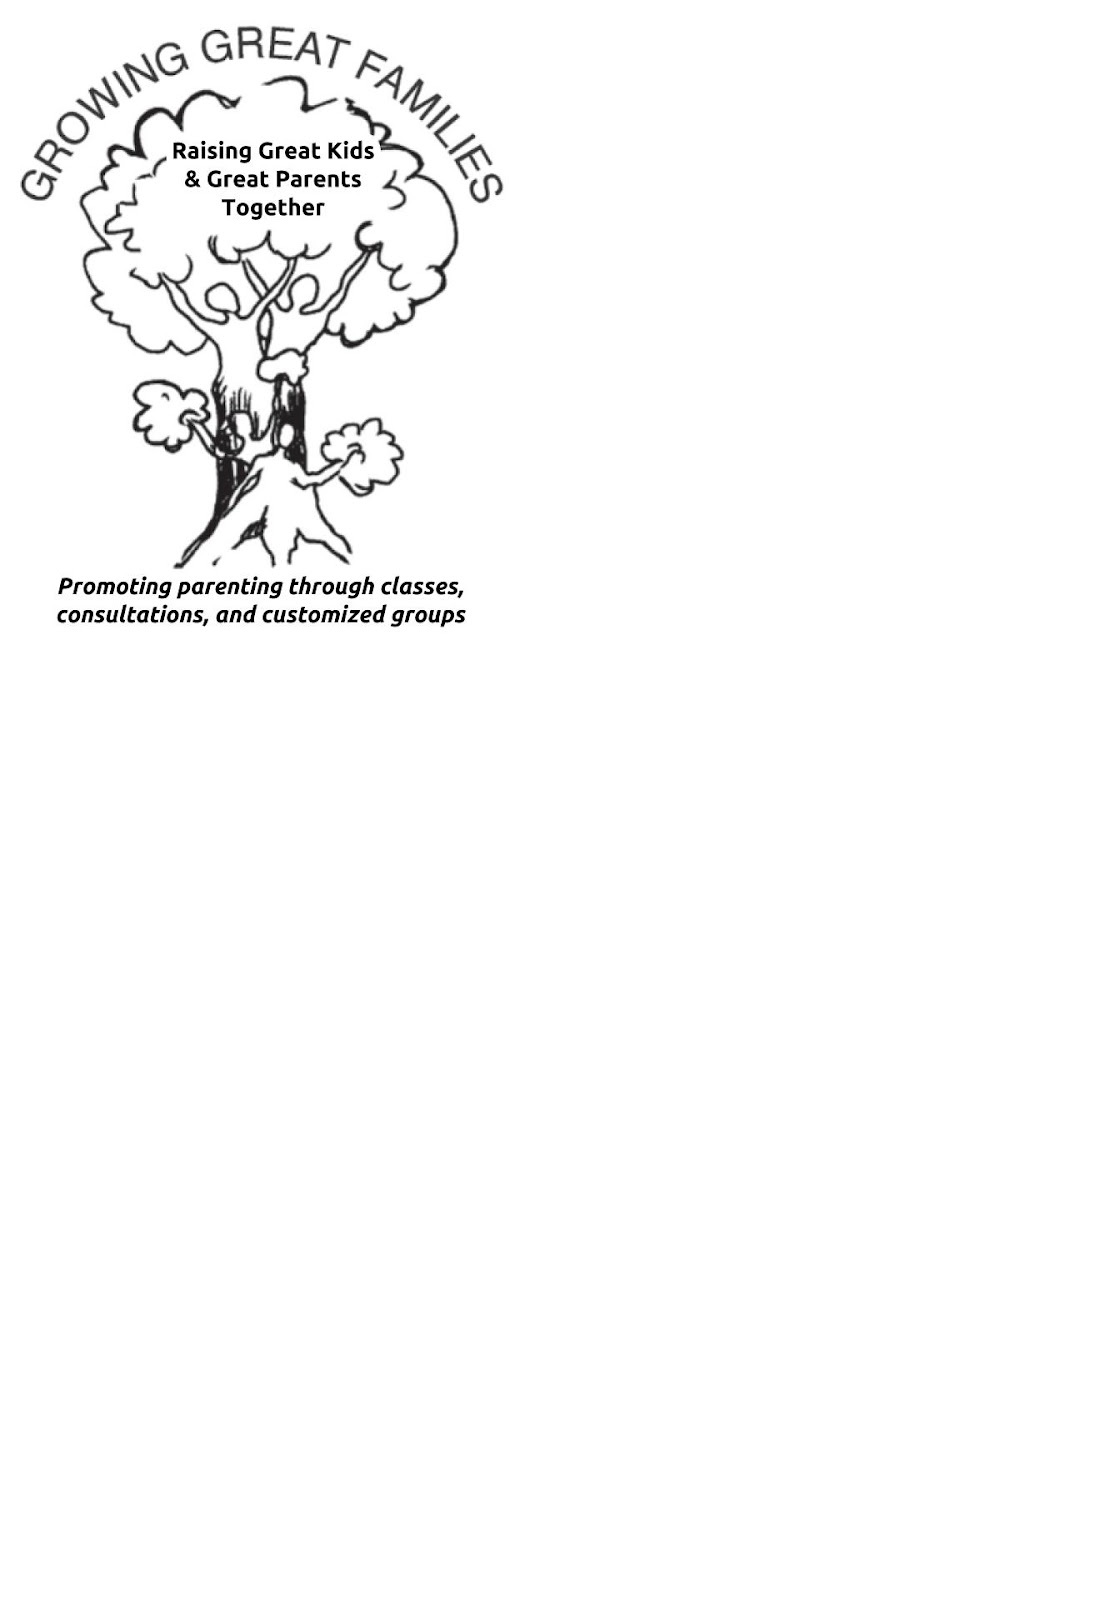 Logo_12_13_2016.jpg